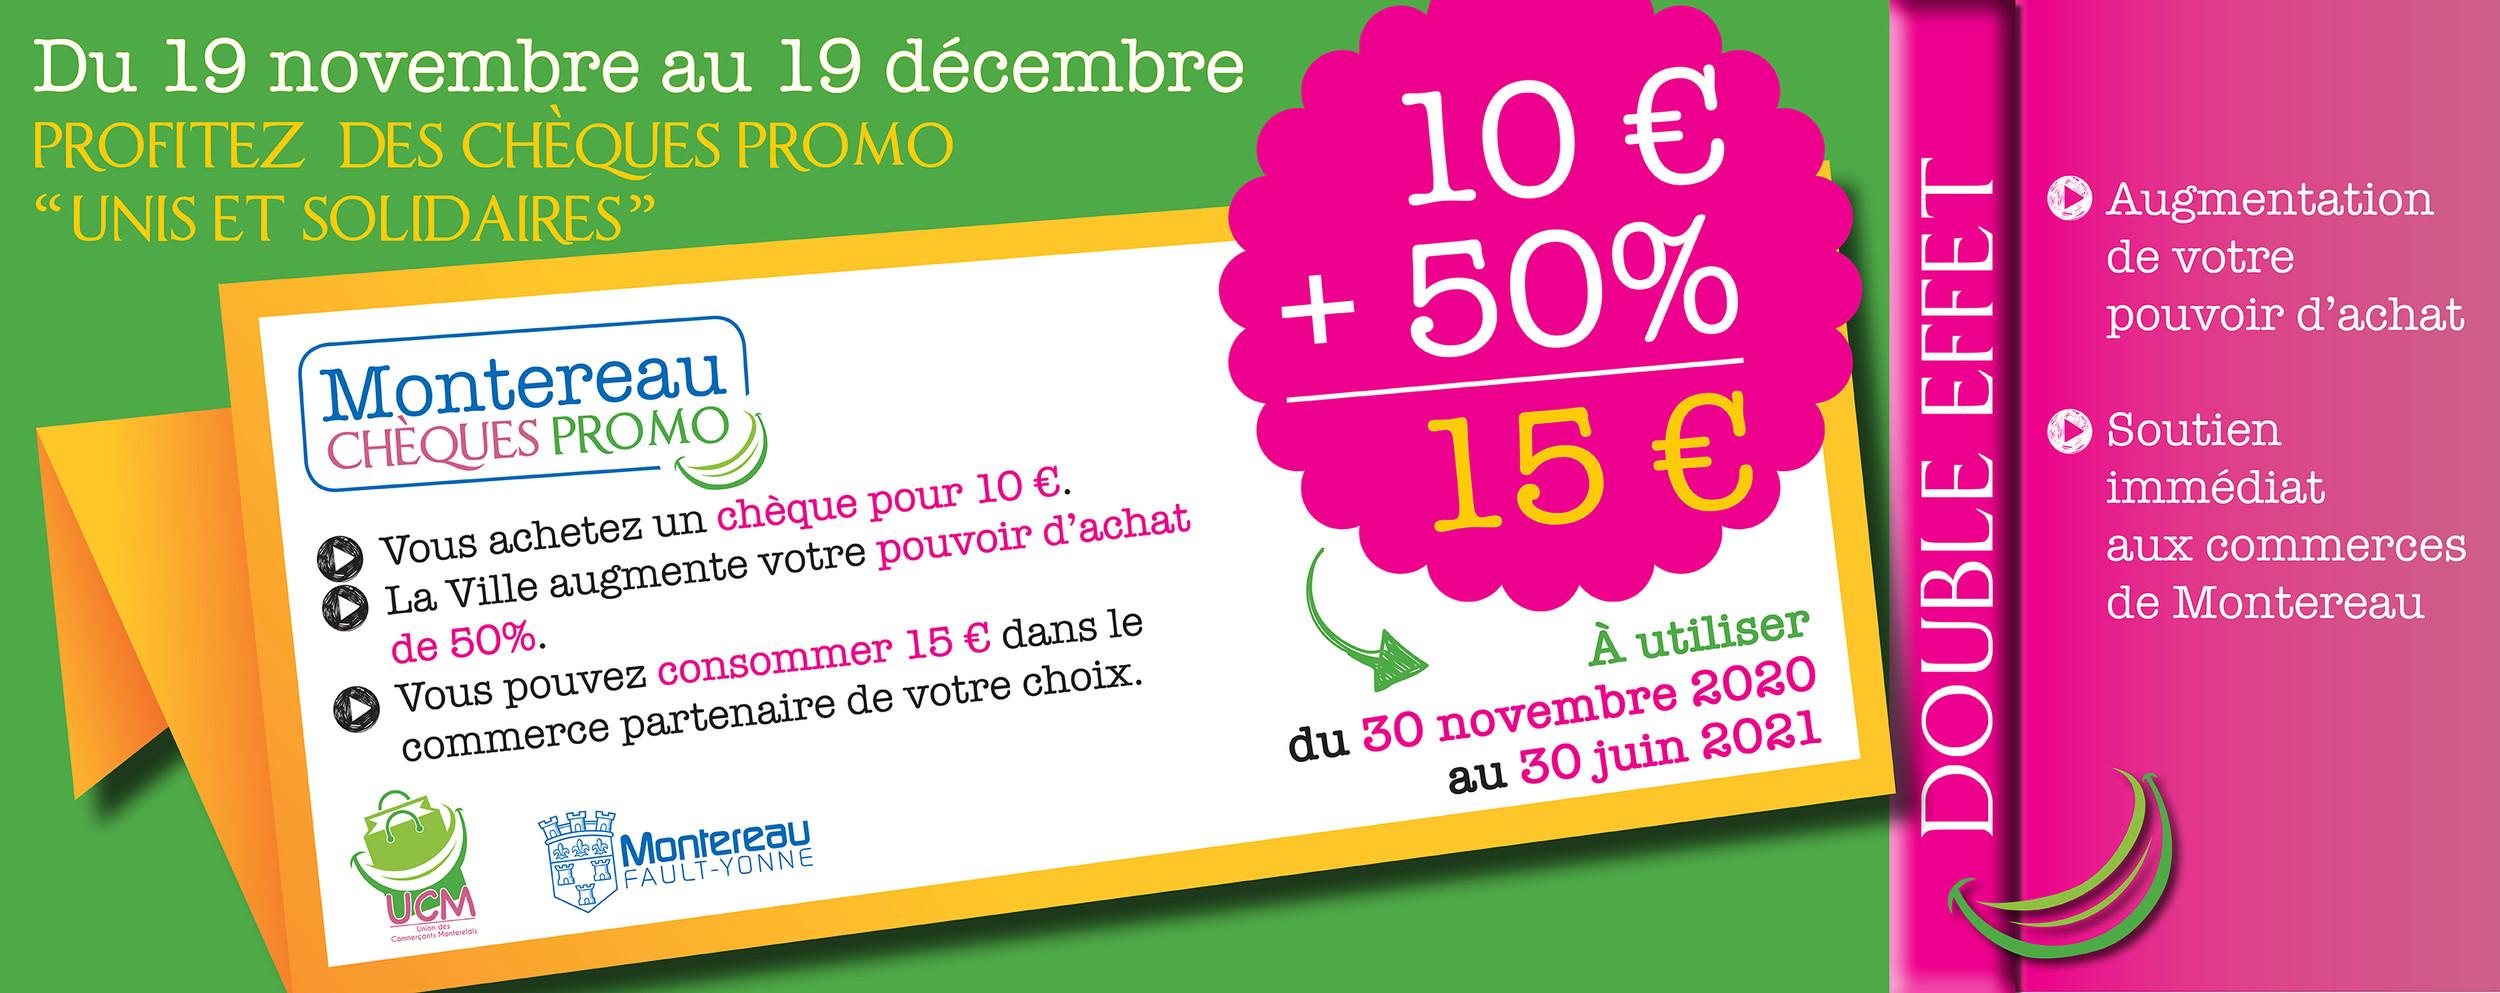 montereau-cheques-promo.fr